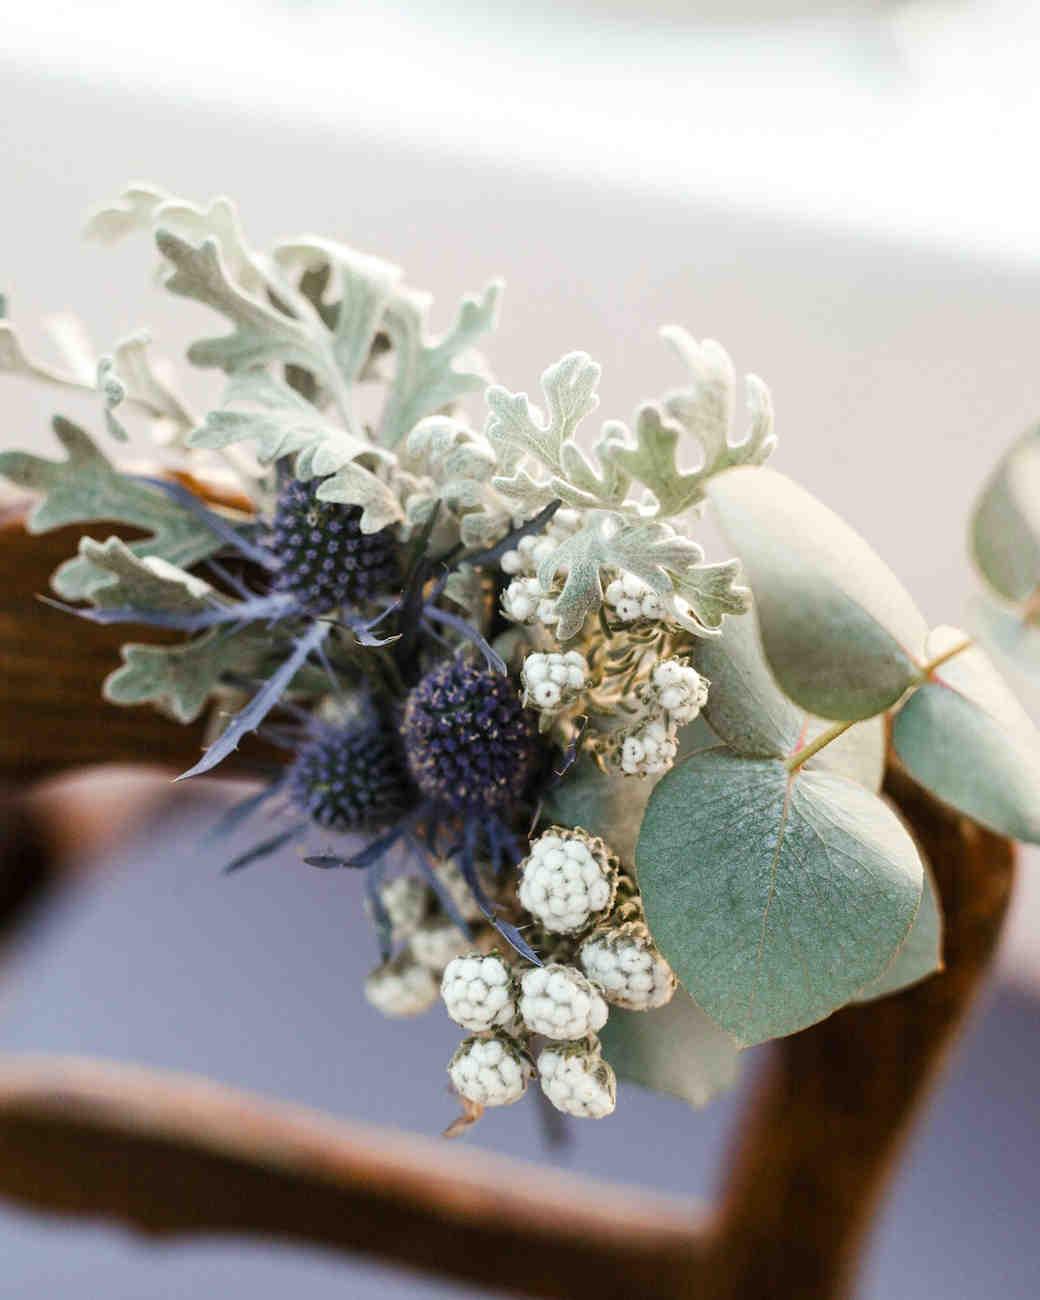 herbal floral arrangment